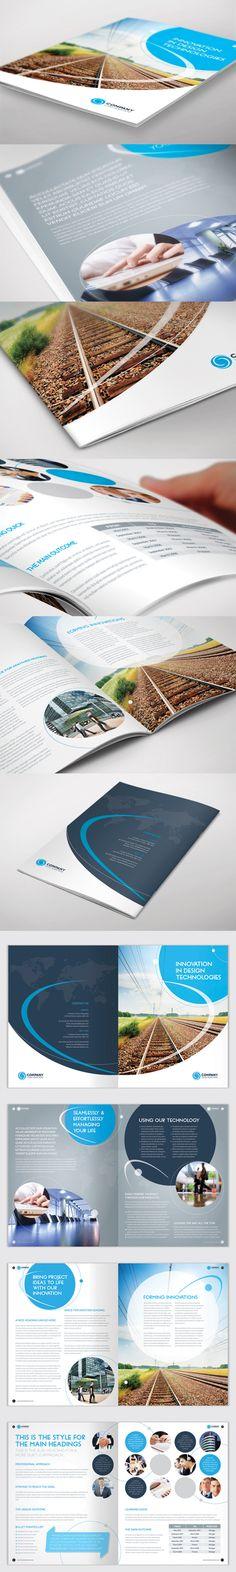 193 Best Brochure Design  Layout images Graph design, Graphics